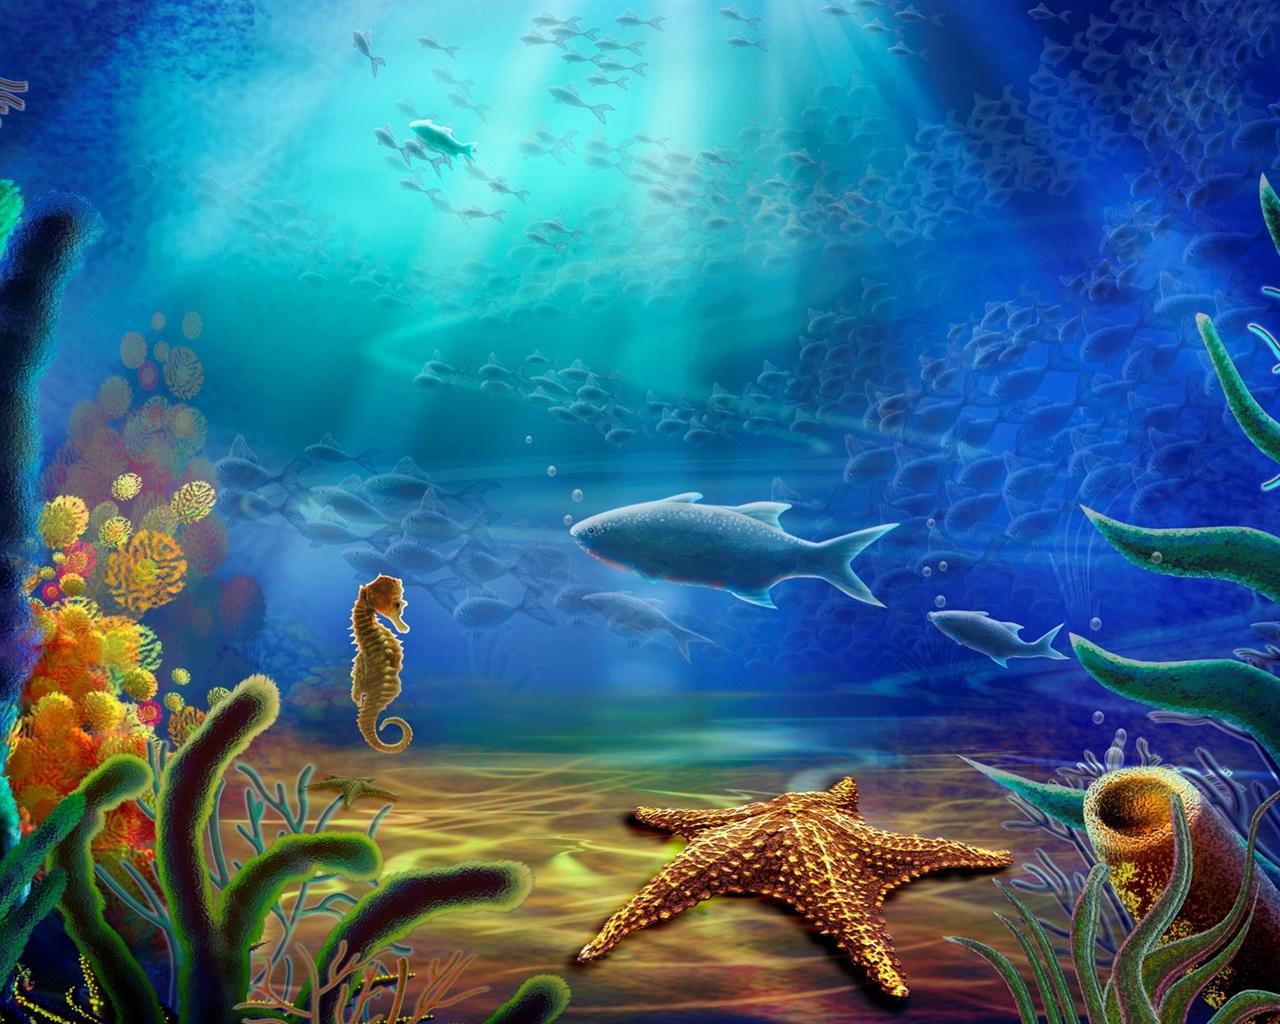 fondos de pantalla animales de mar de fondo peces